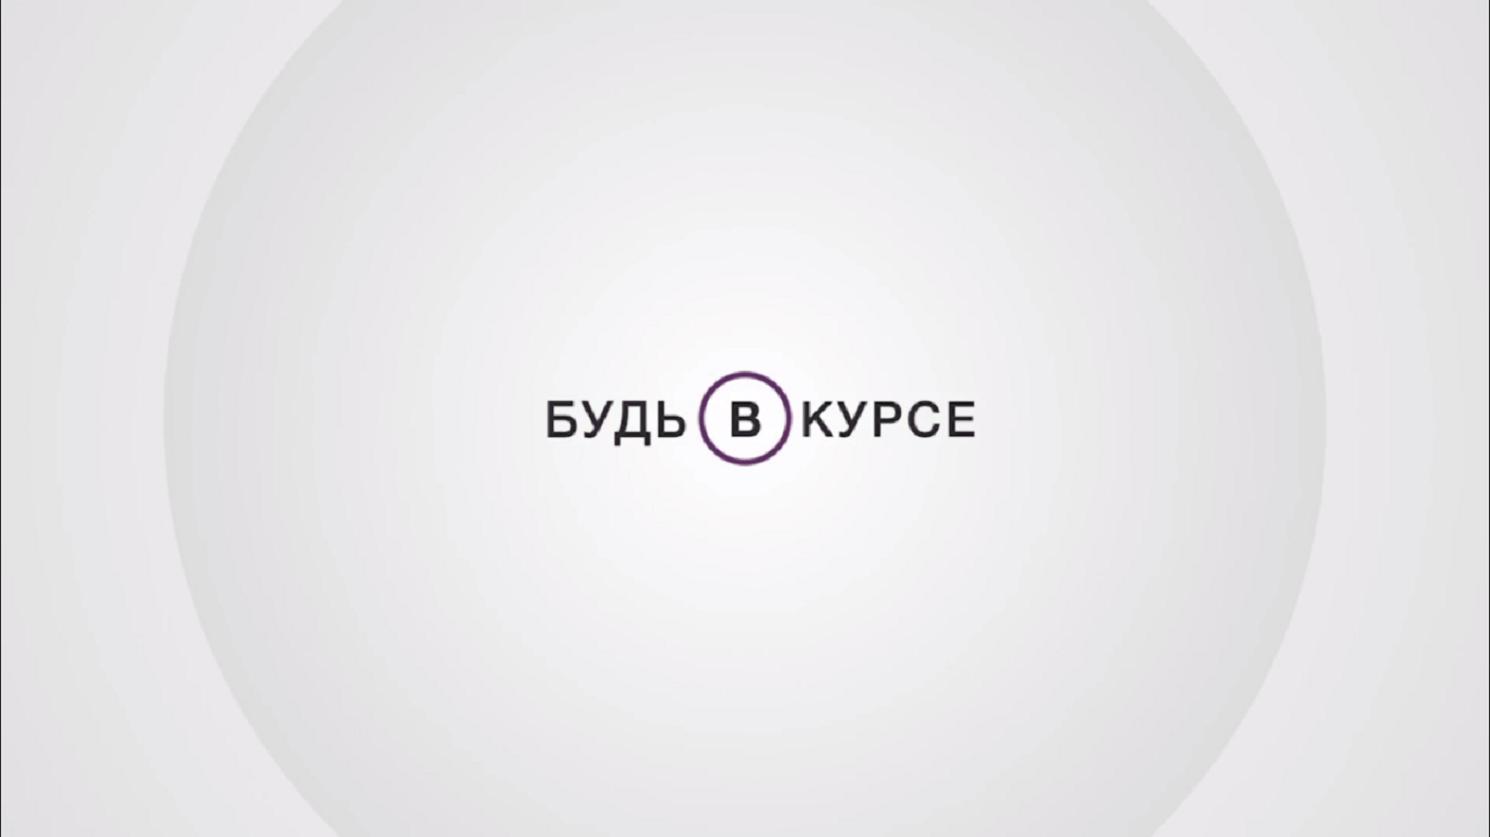 bud1-1250x703-1-2